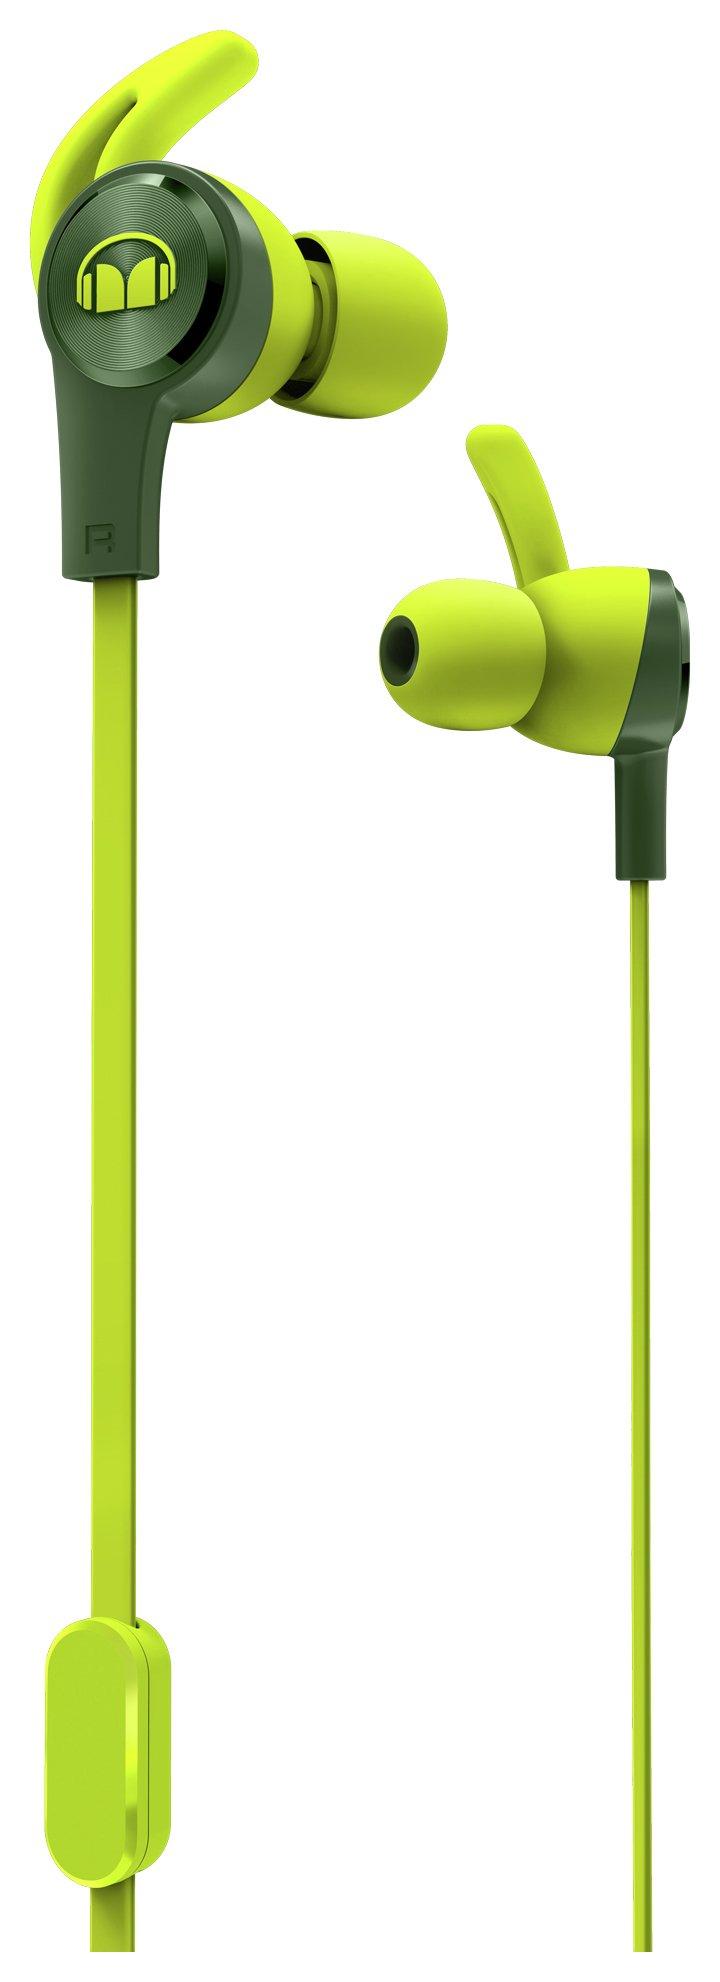 Monster iSport Achieve In-Ear Headphones - Green.